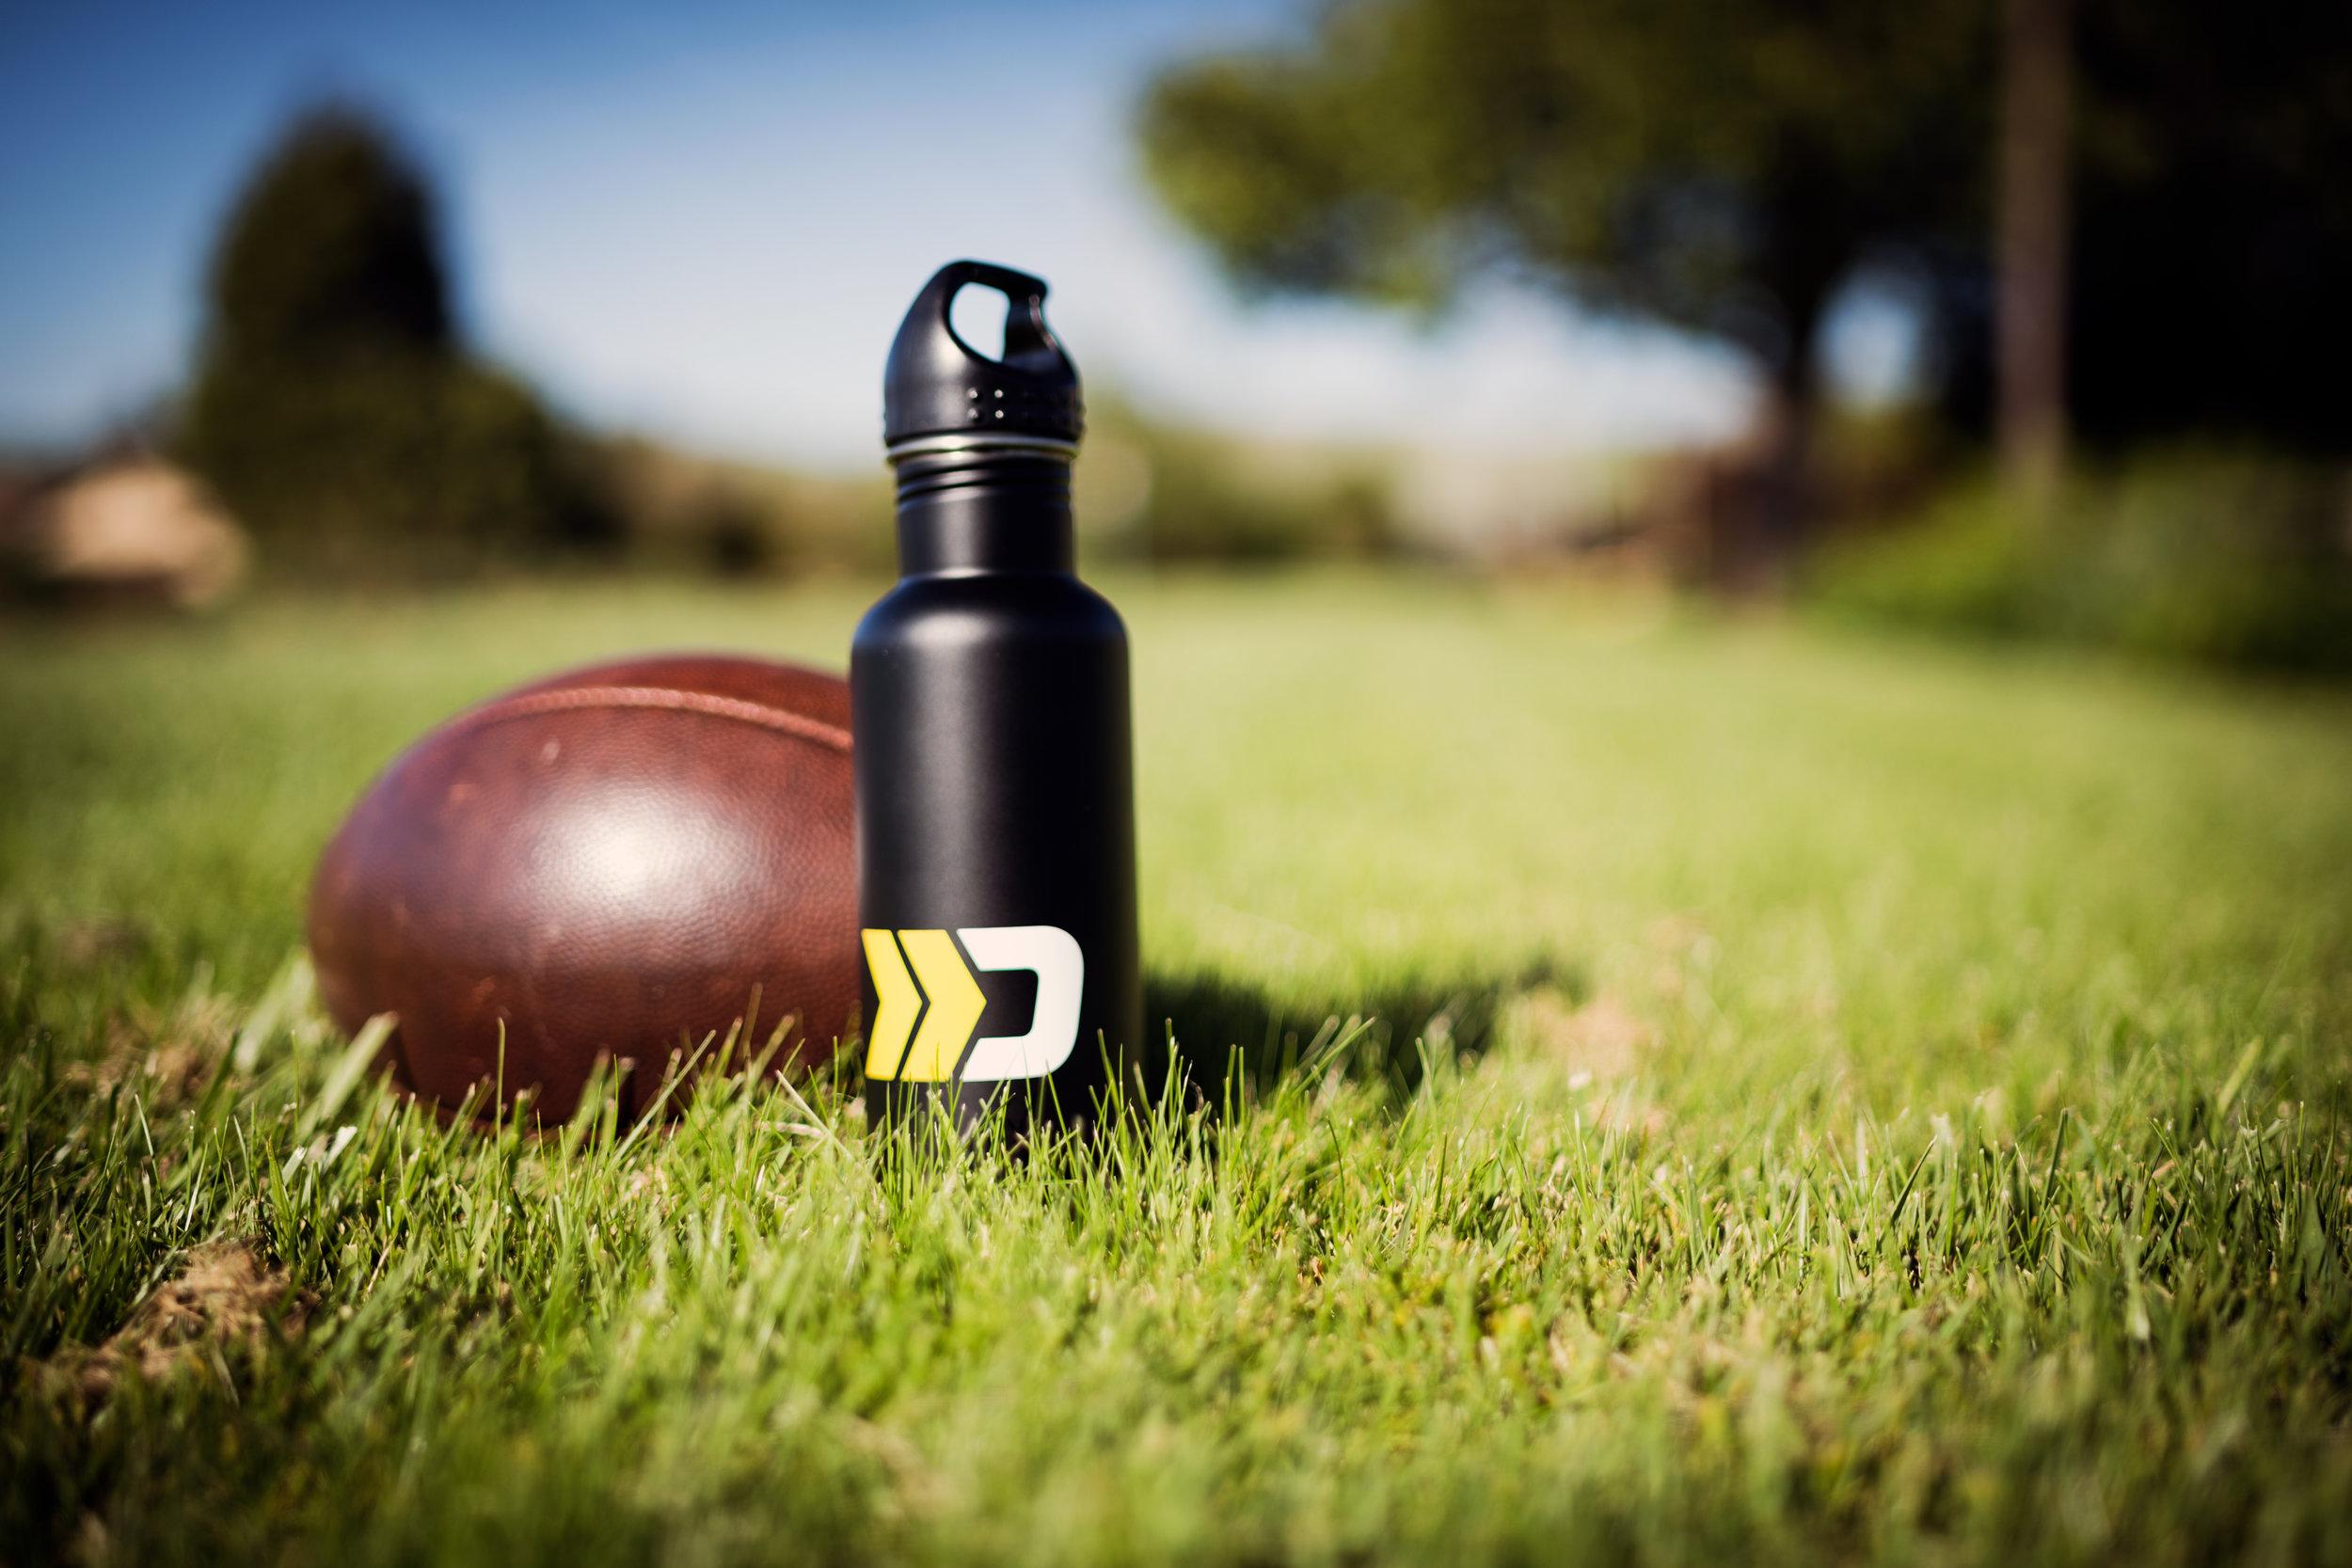 DualThreat_SummerFootball_Bottle.jpg